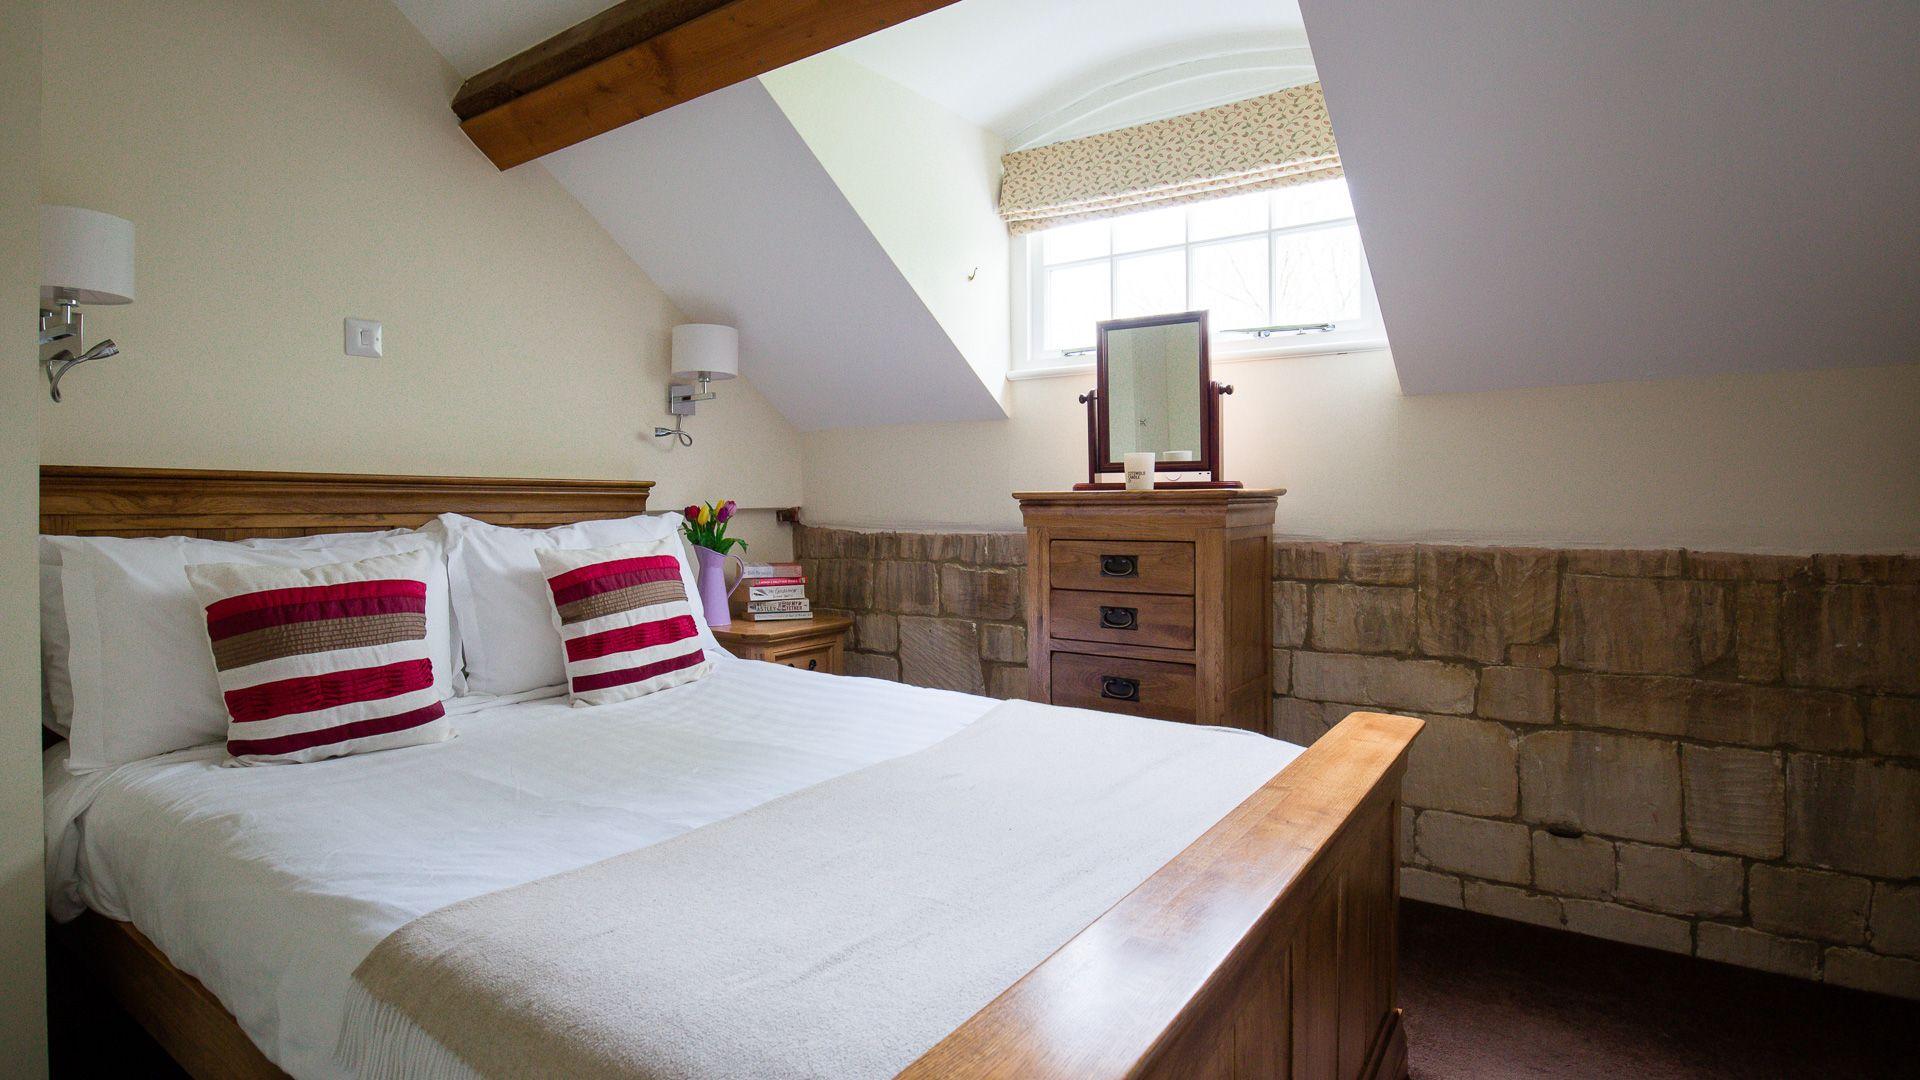 Bedroom One, Prince Rupert at Sudeley Castle, Bolthole Retreats